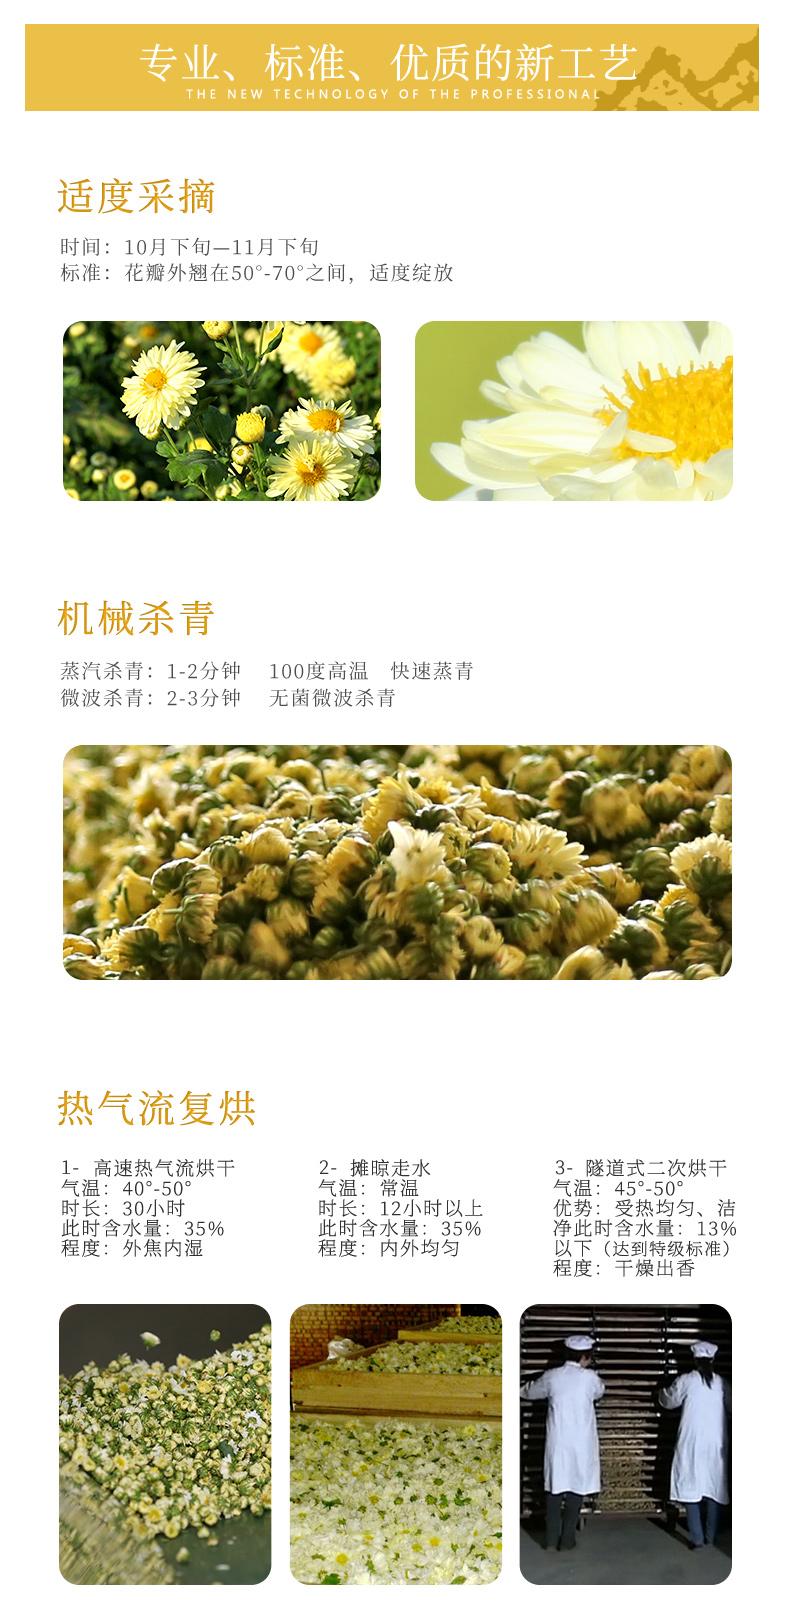 Chinese Tea【天福茗茶有情系列 白毫茉莉150g//盒】Tenfu YouQing BaiHao Jasmine Tea新品上市 花草茶茶叶 花茶免運費